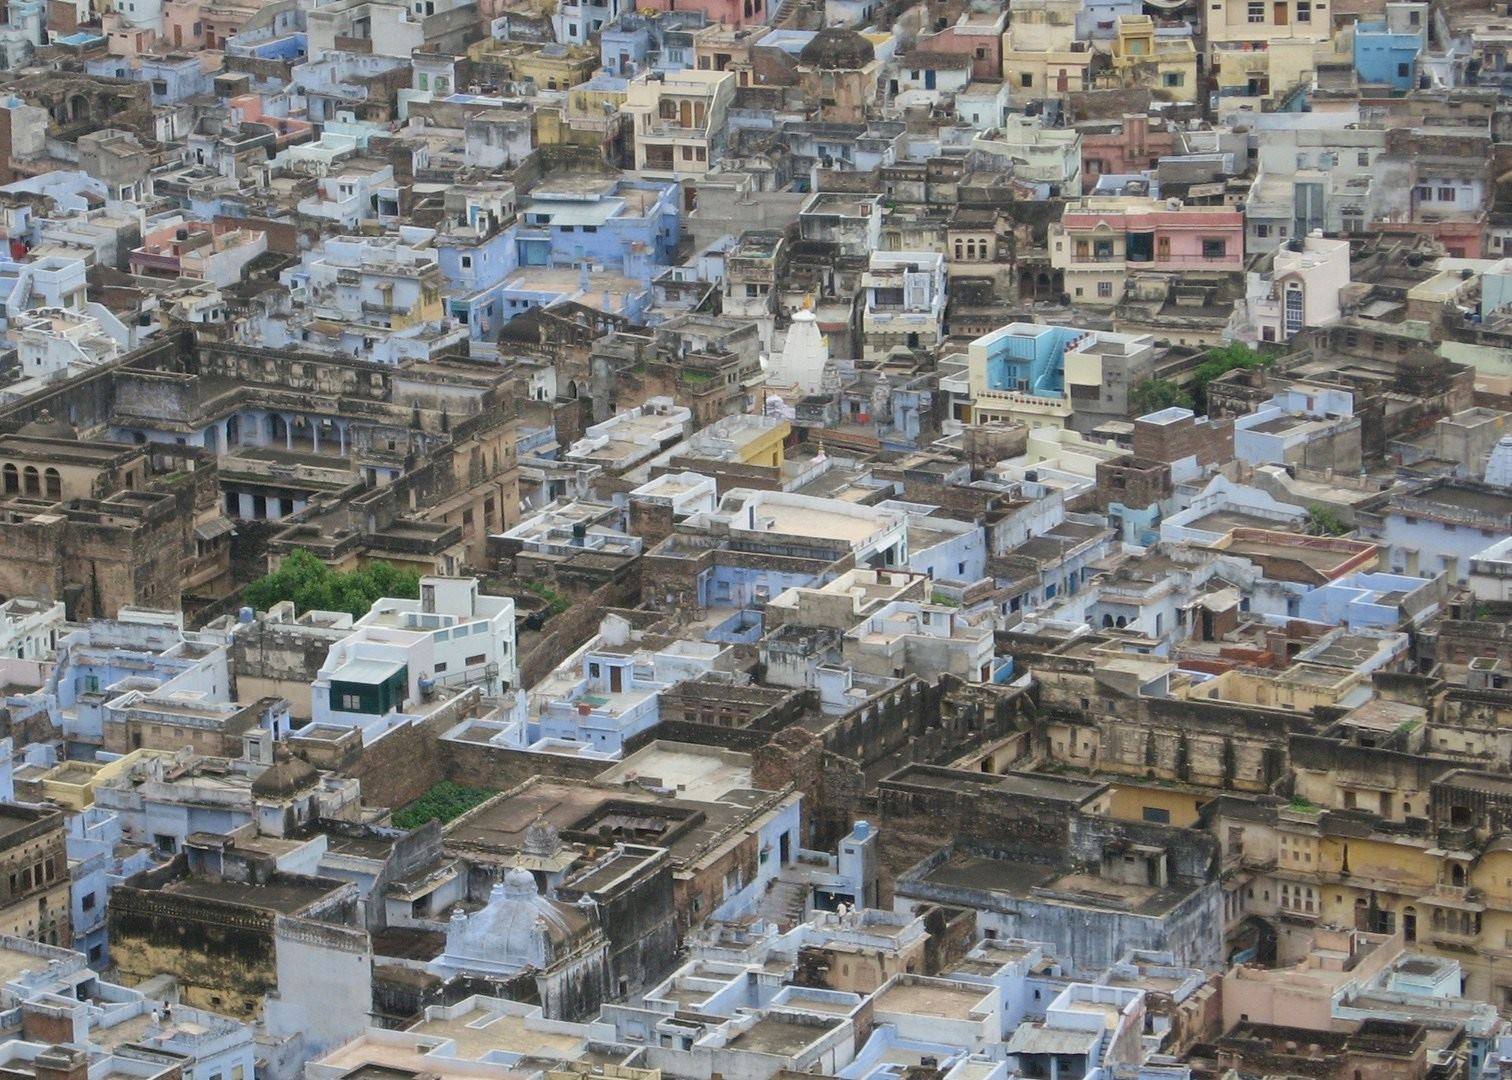 Bundi India  city photos gallery : ... bundi bundi india market seller bundi india bundi palace india city